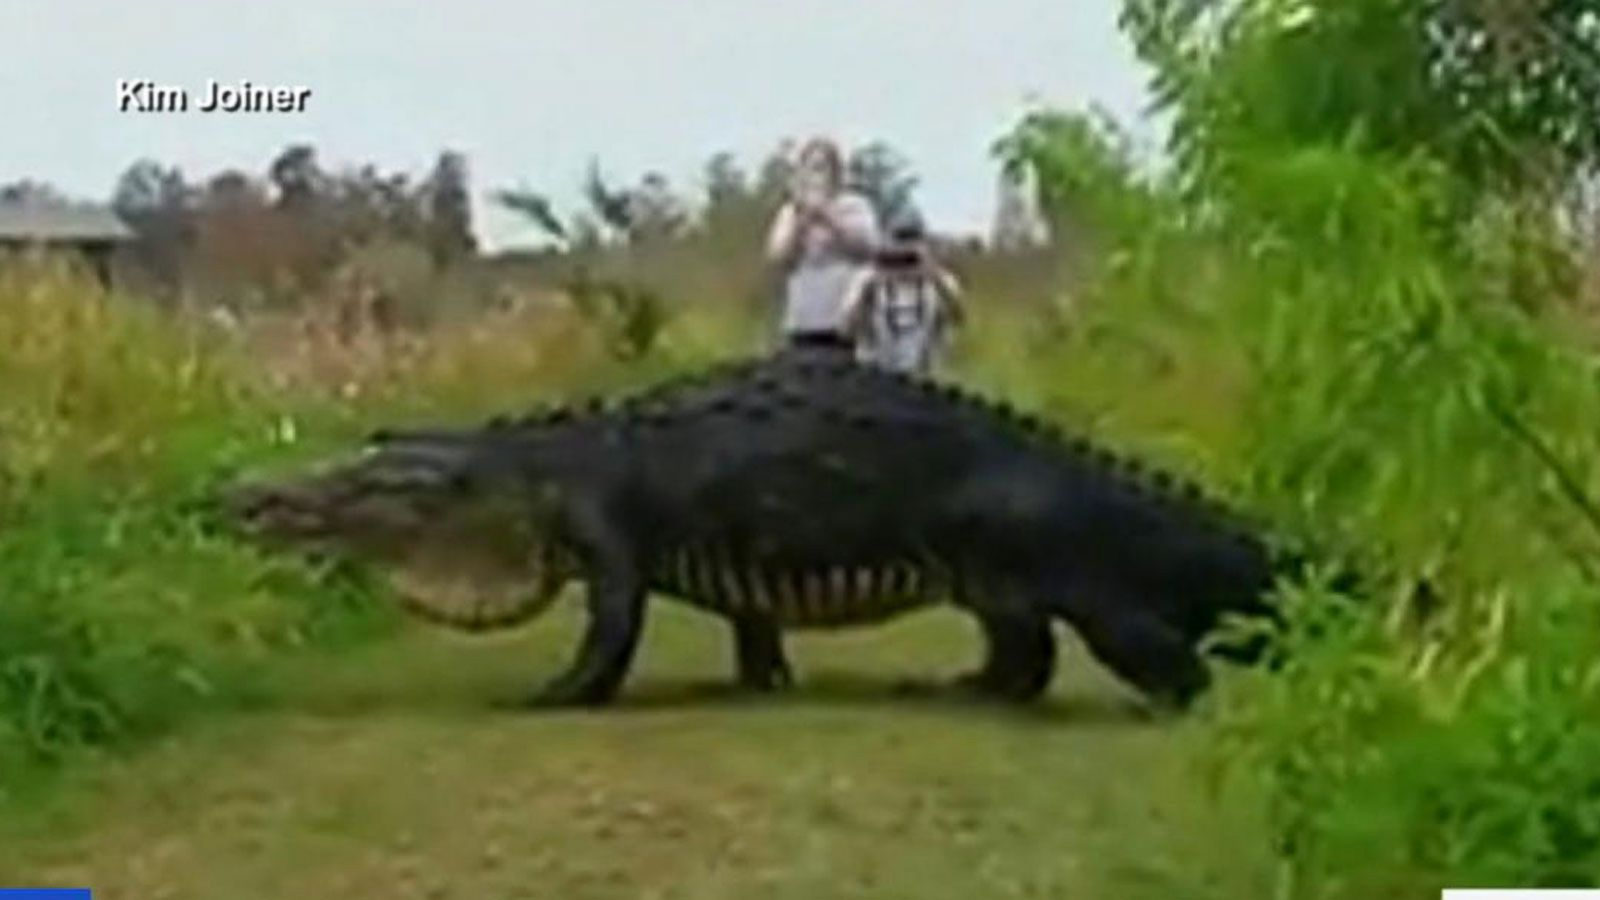 VIDEO: Massive Alligator Spotted at Nature Preserve